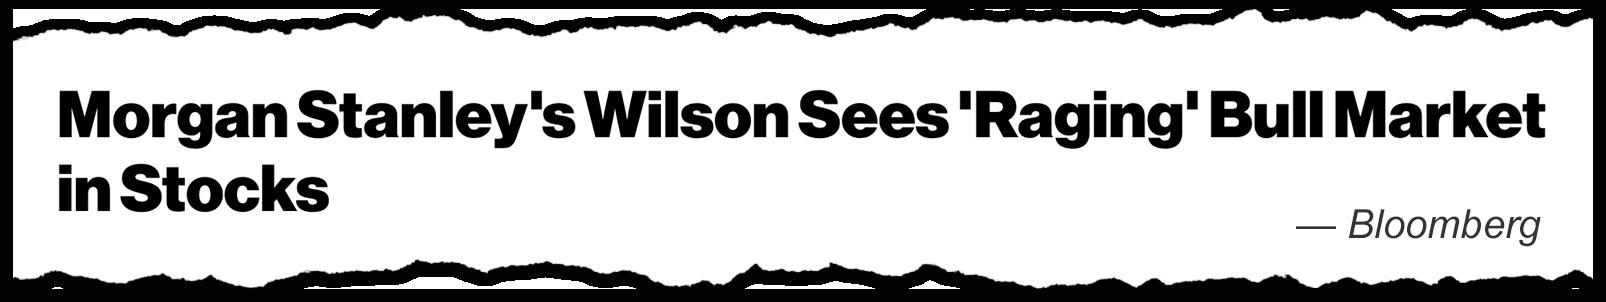 Morgan Stanley's Wilson Raging Bull Market